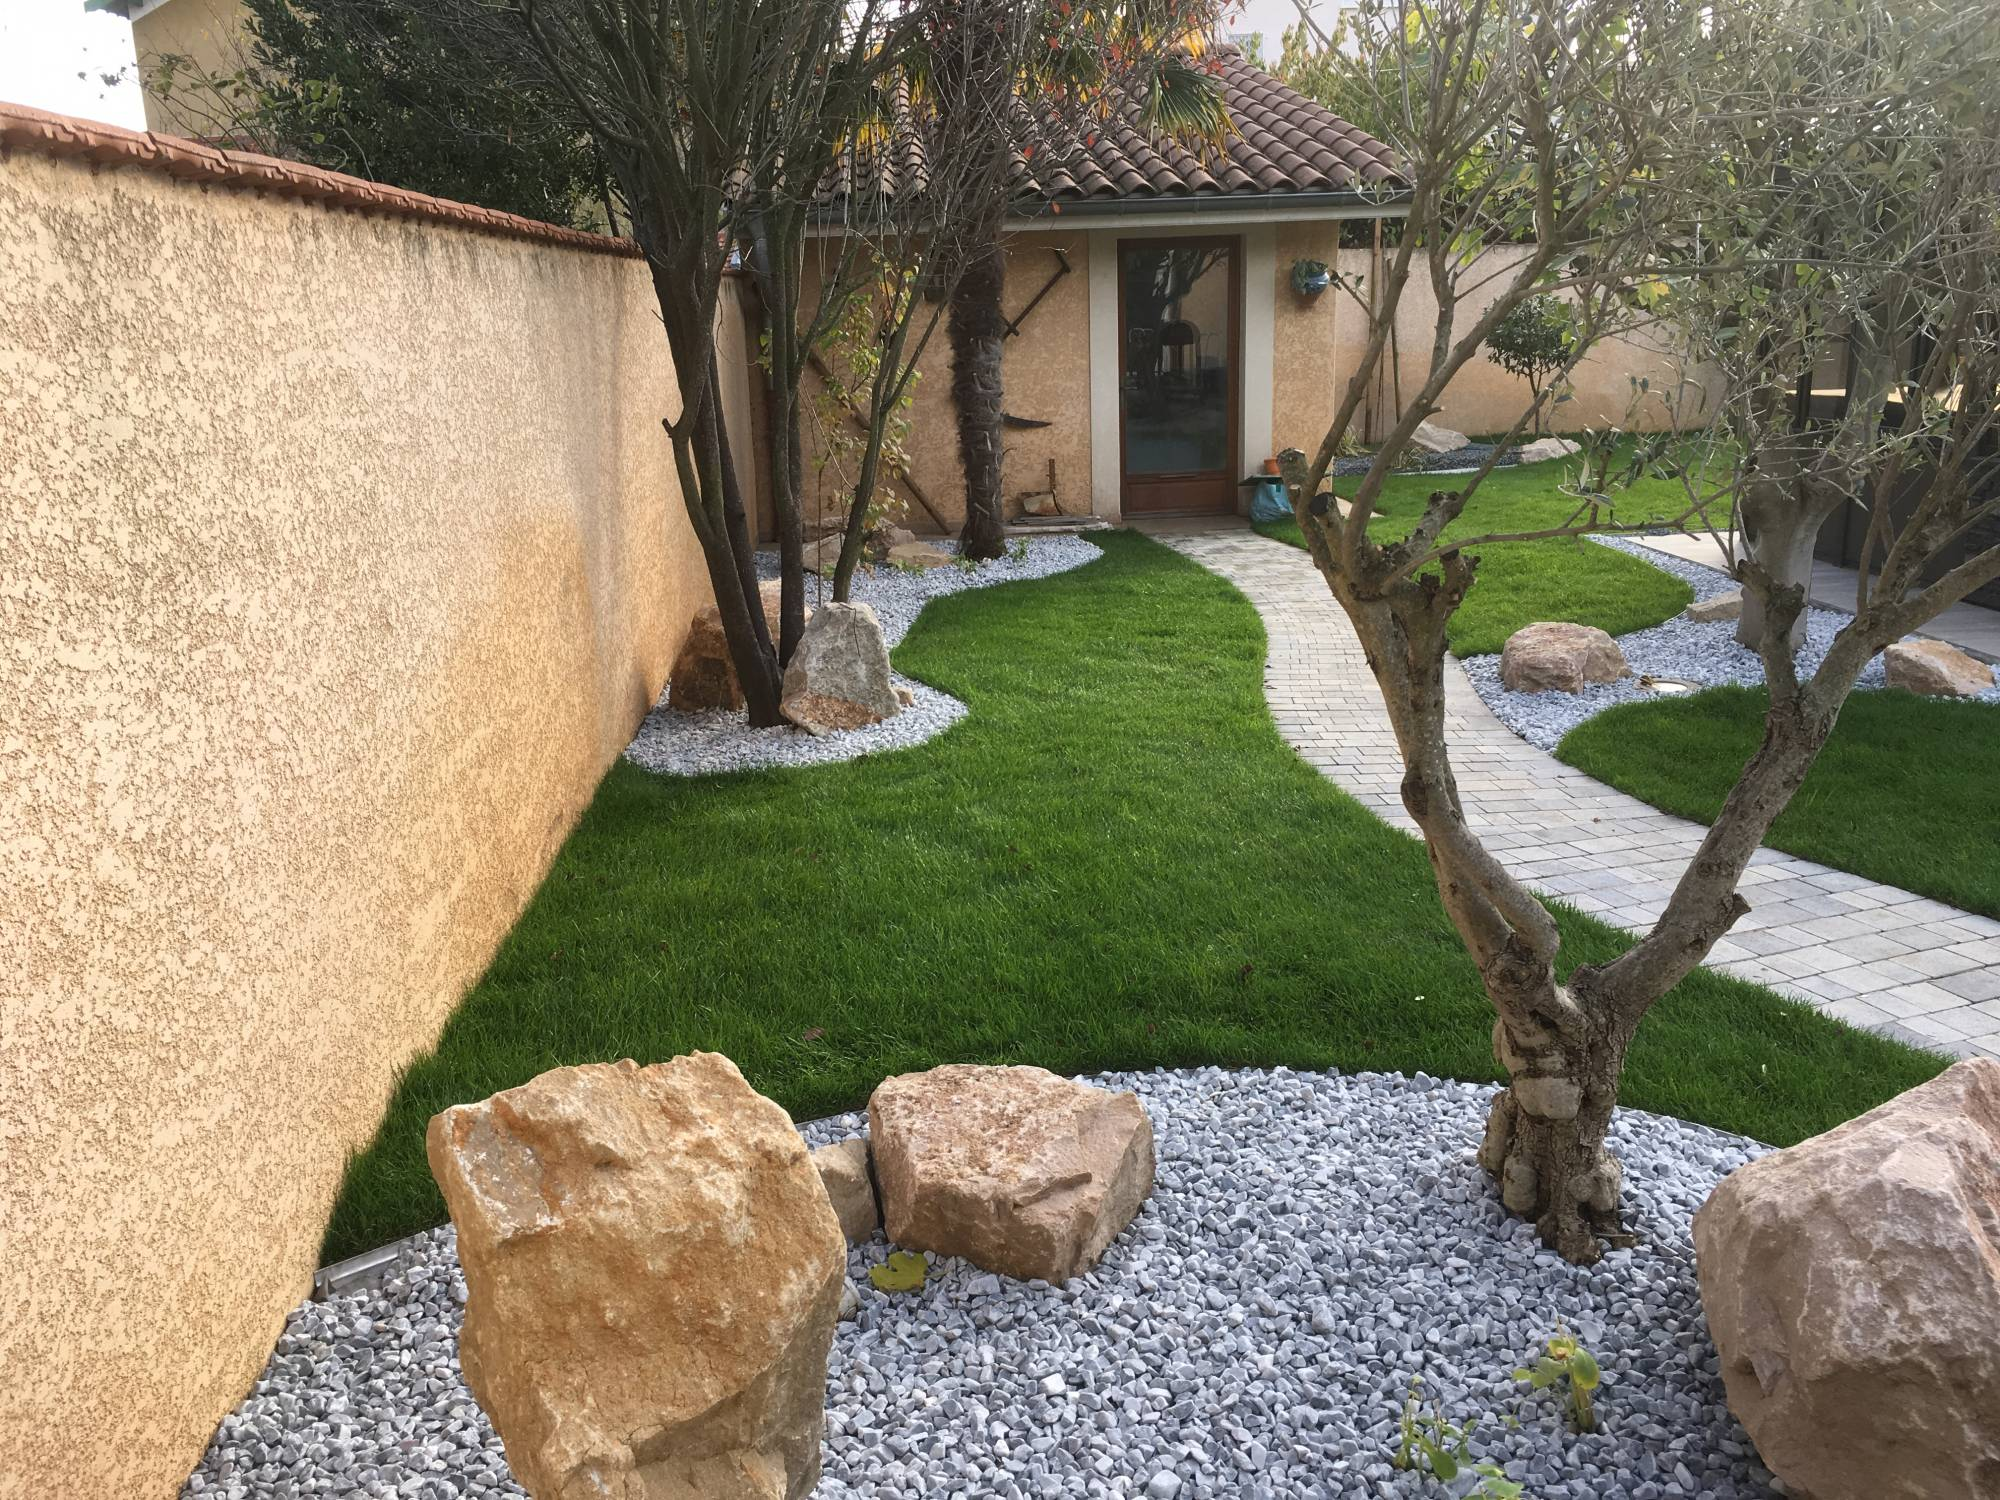 Paysagiste jardinier chuzelles cr ation et entretien for Entretien jardin 74